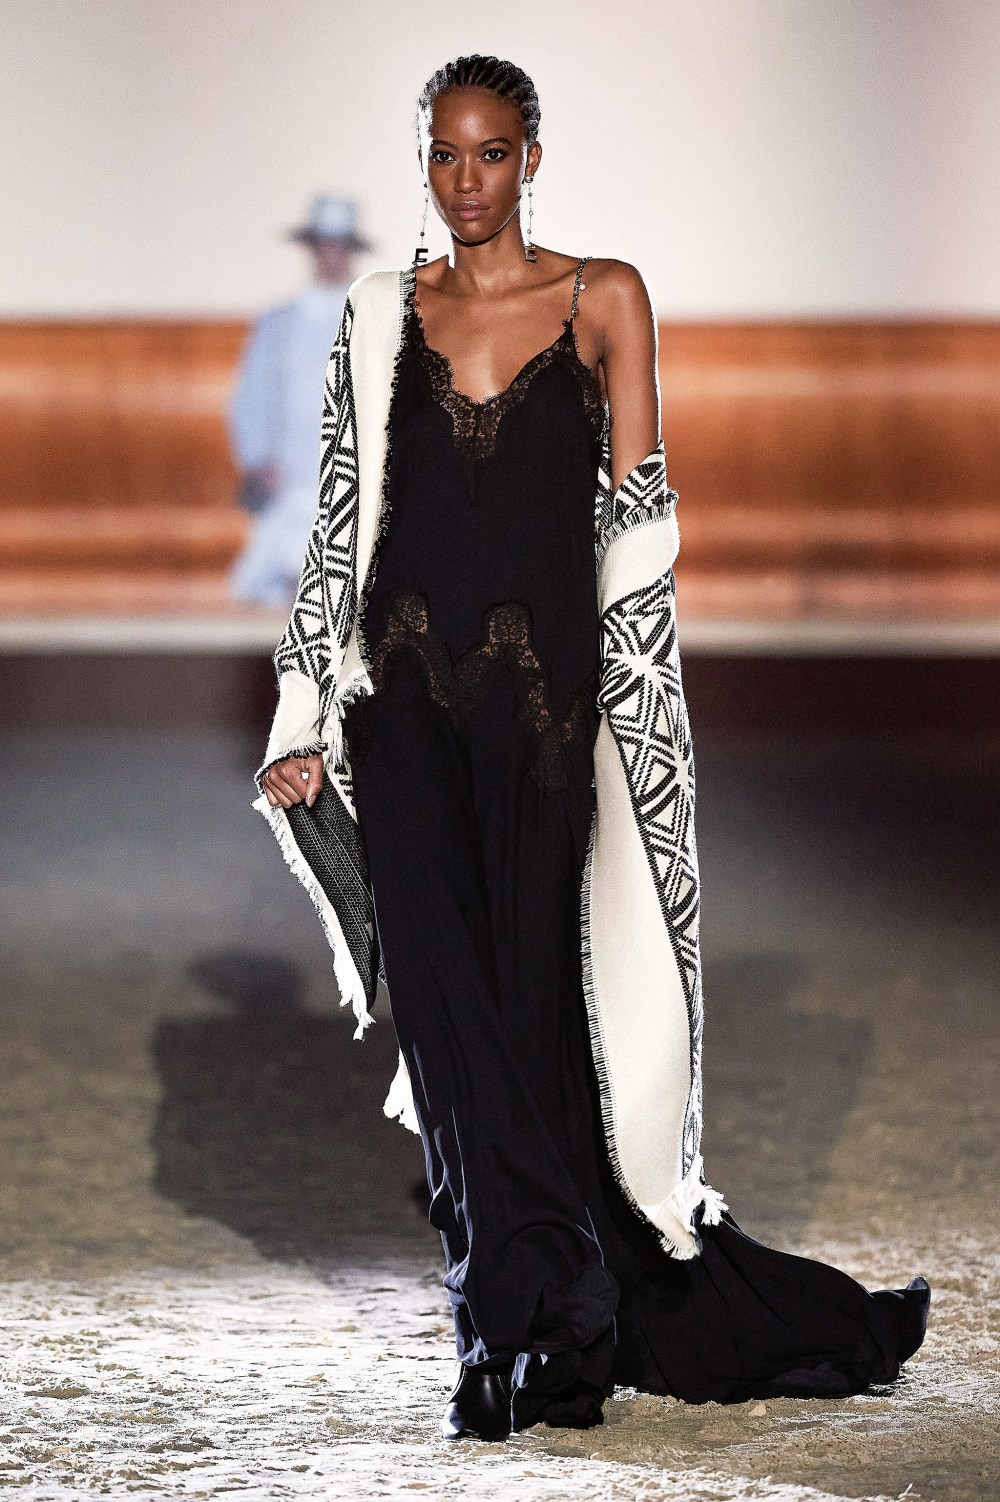 Elisabetta Franchi: Elisabetta Franchi Fall Winter 2021-22 Fashion Show Photo #52